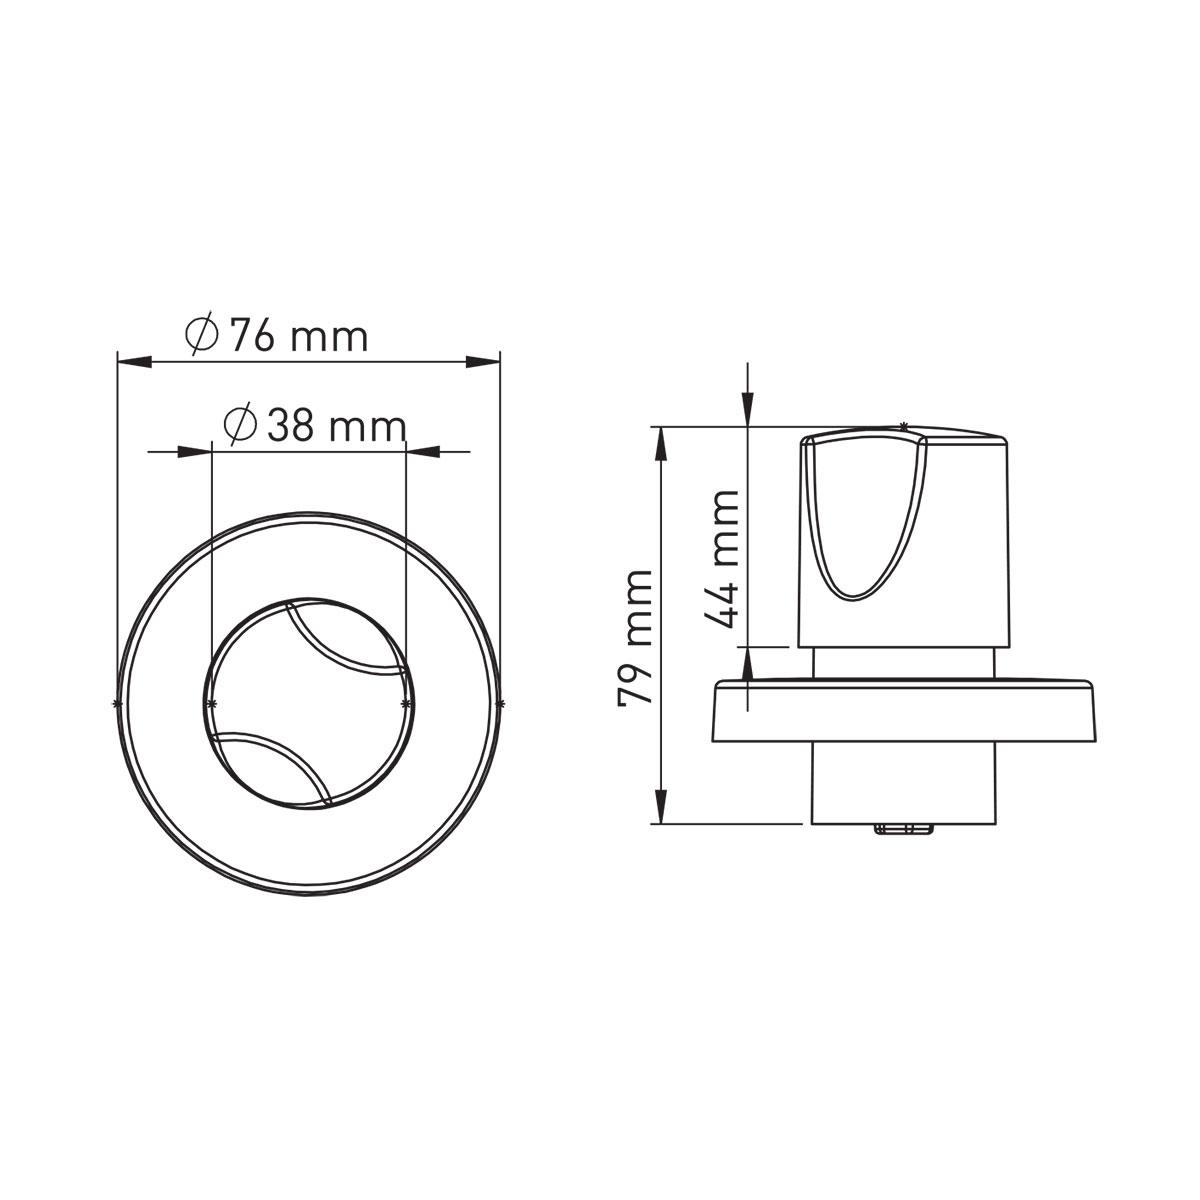 Yuvarlak Başlıklı Ankastre Ara Kesme Valf  – 20 mm